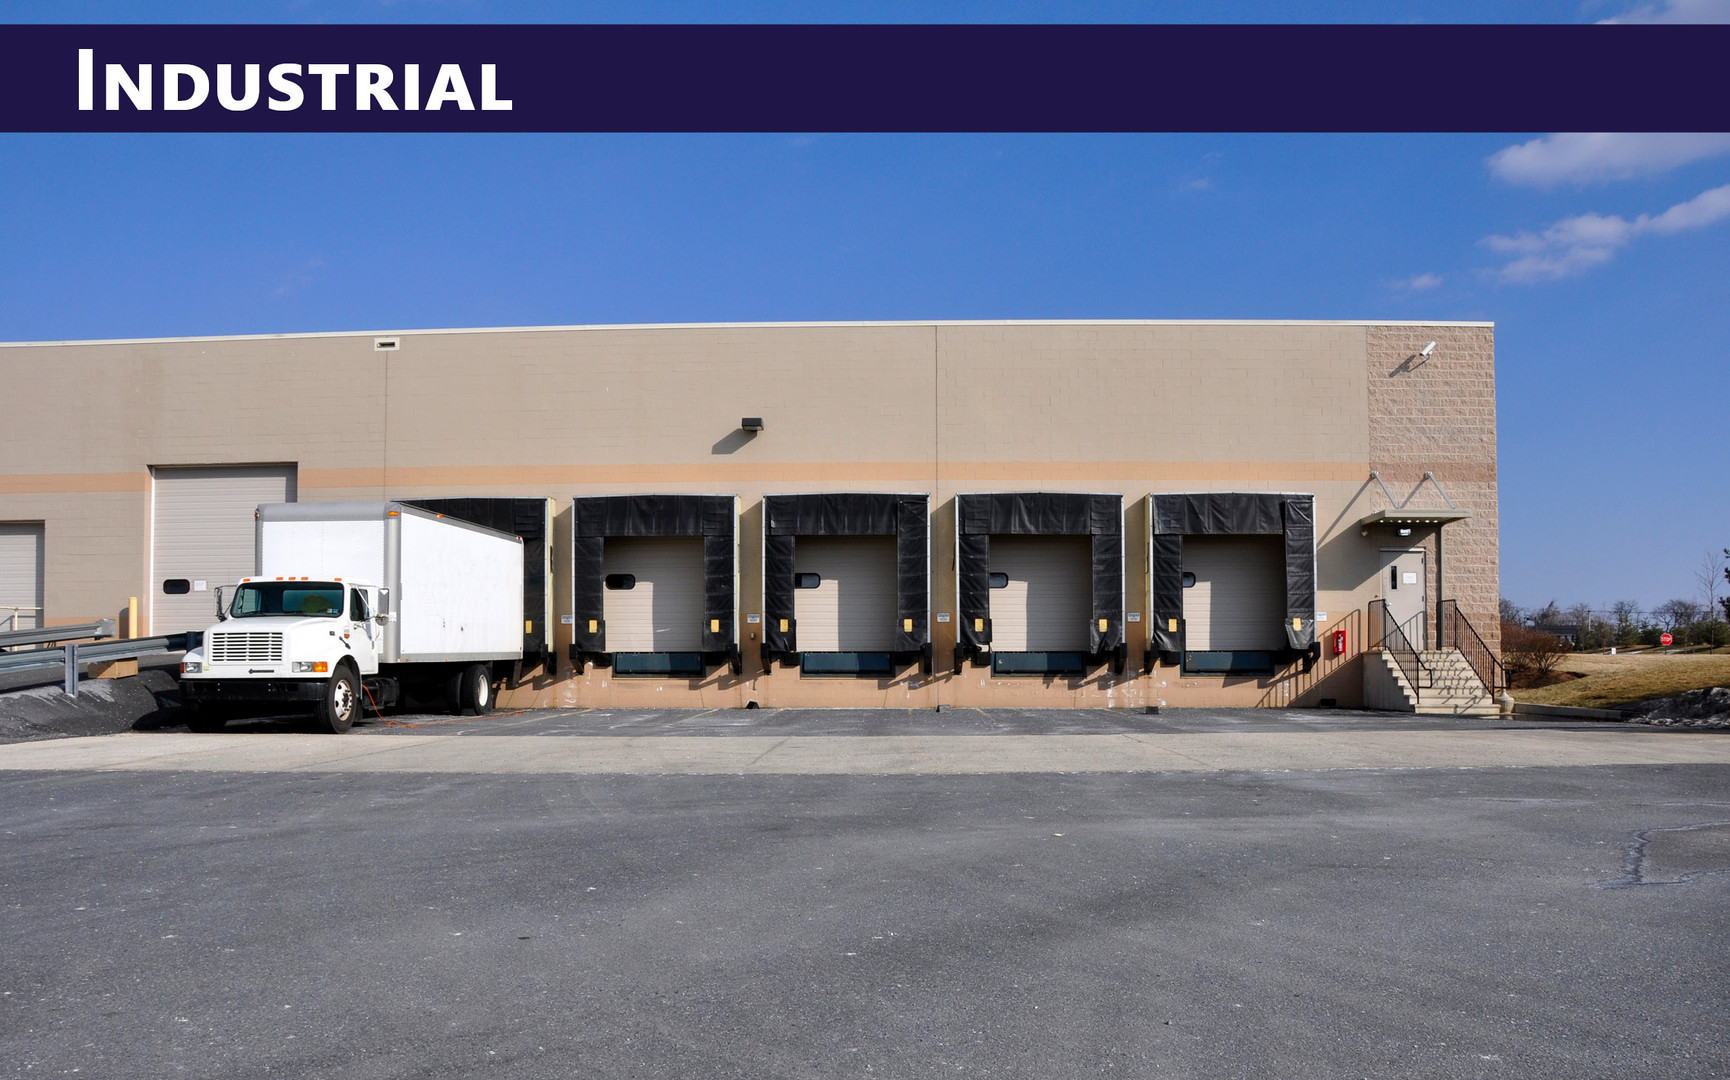 1200x775 Industrial.jpg